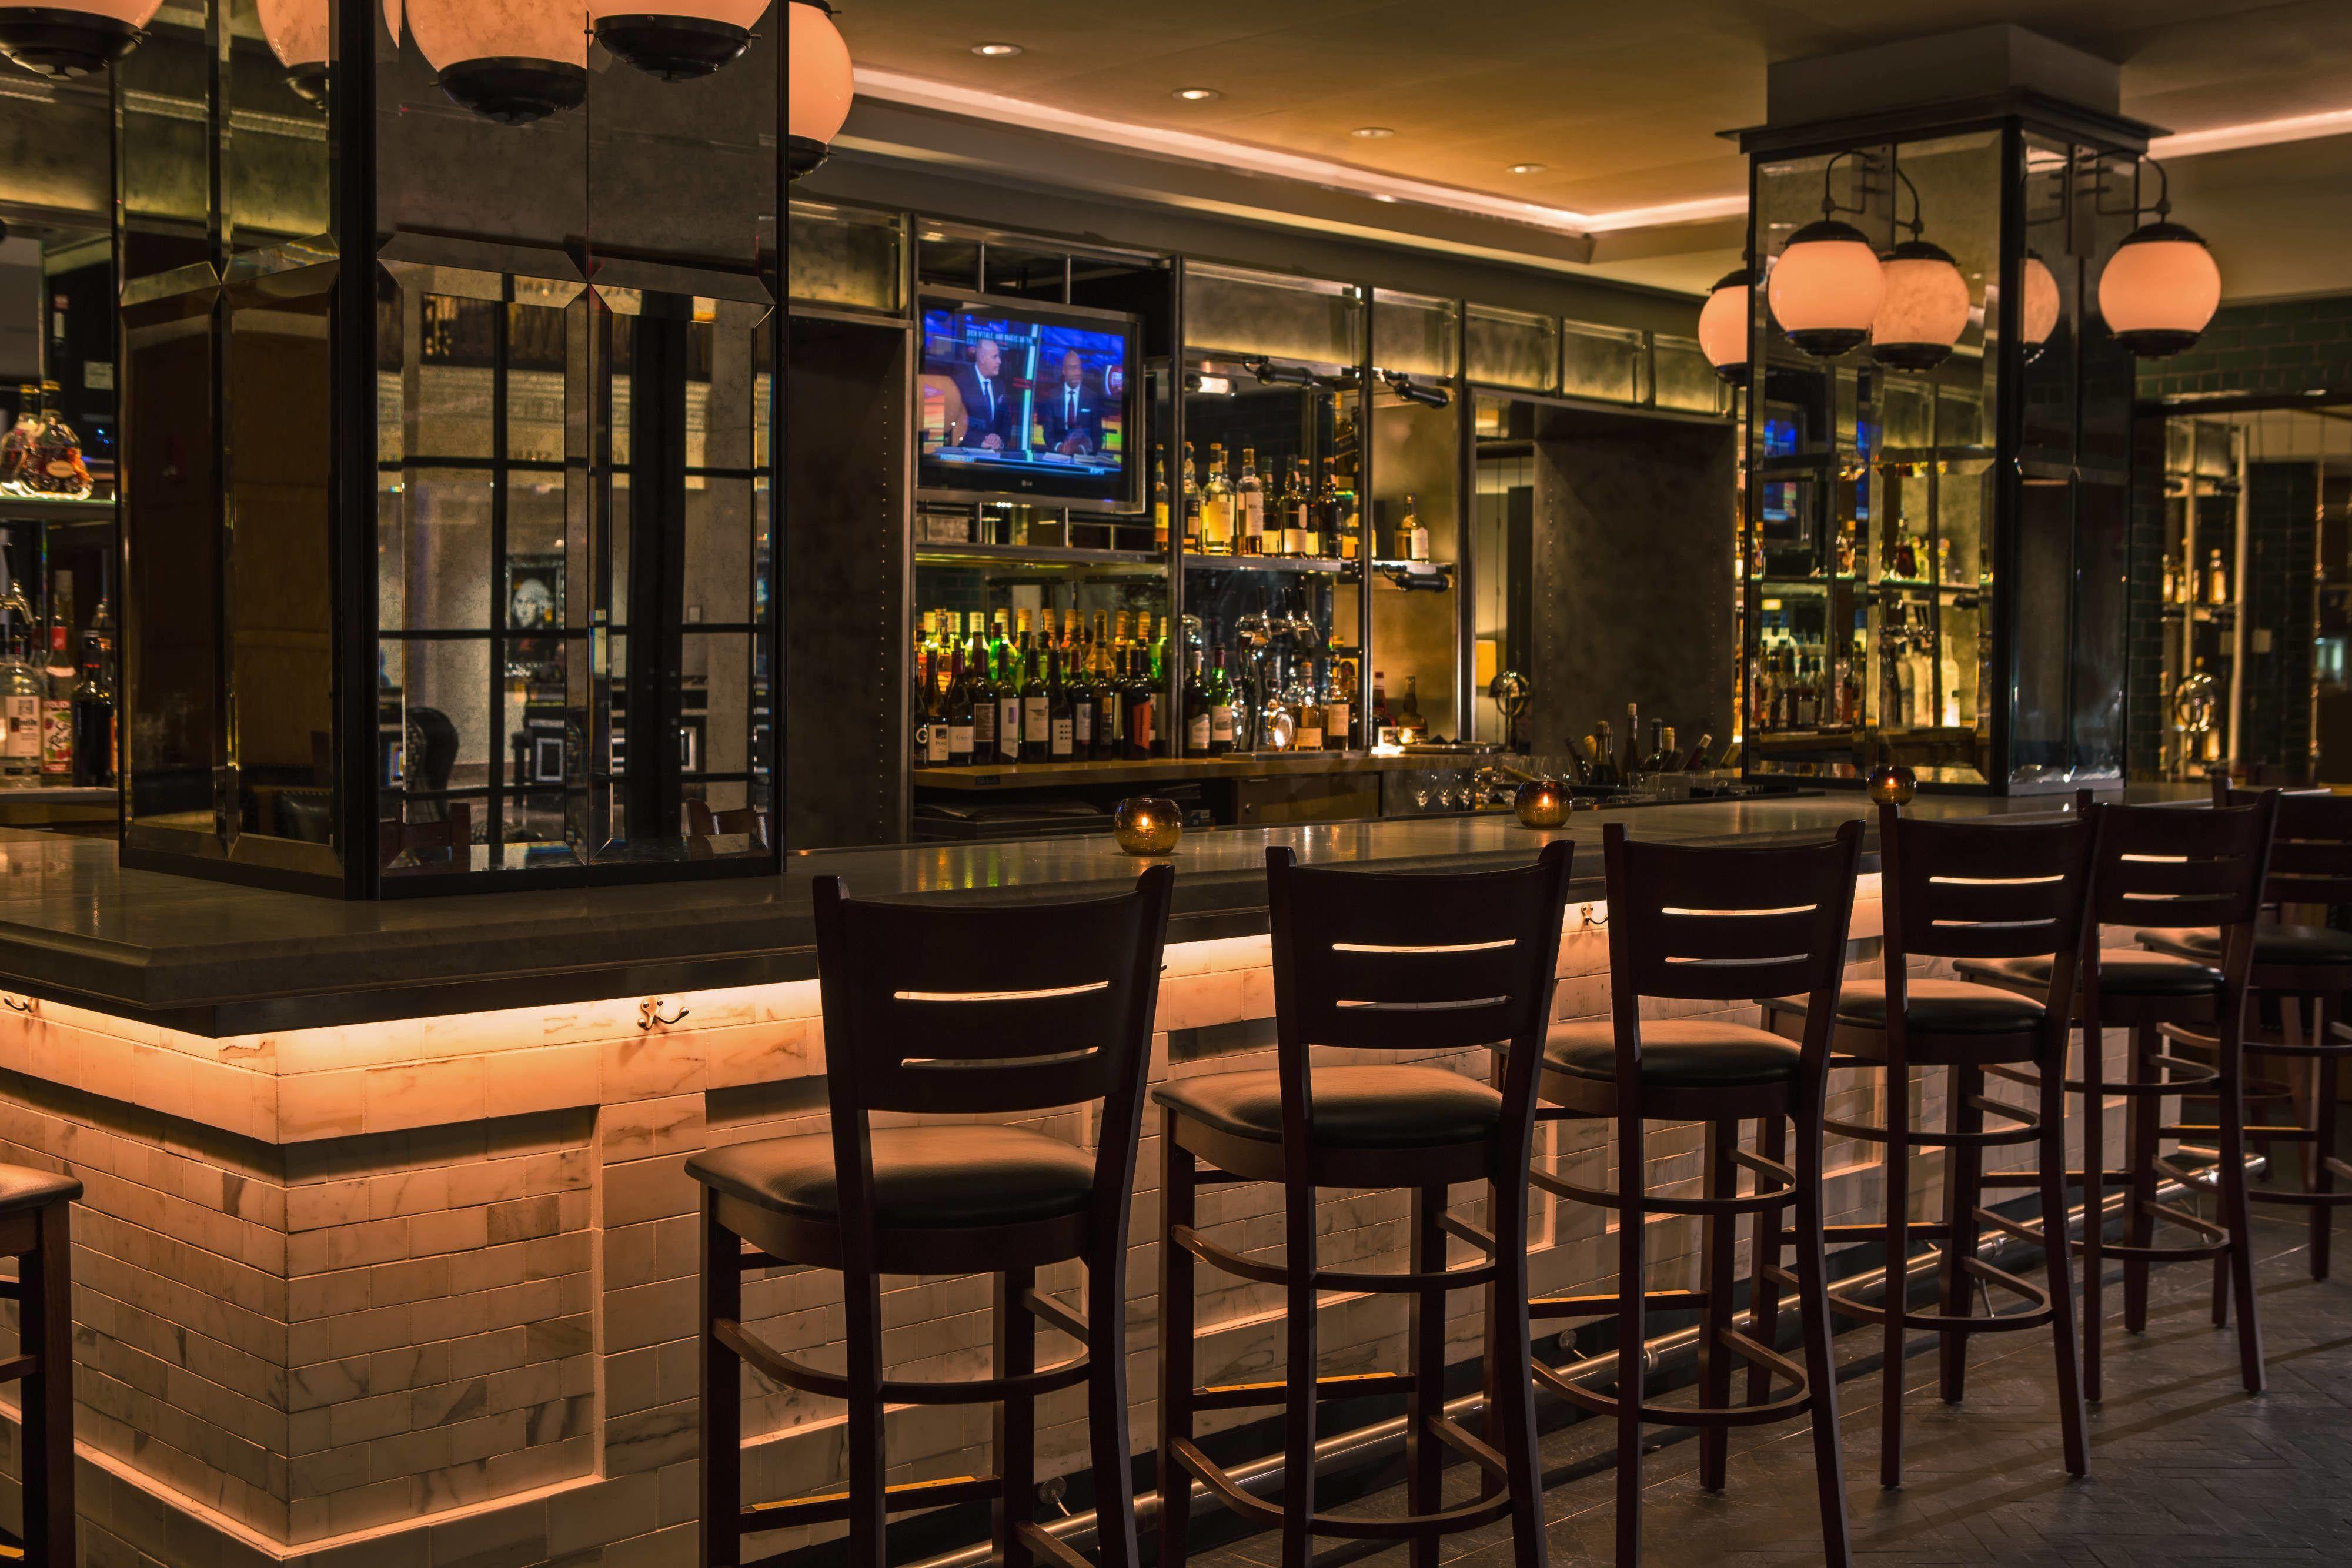 The Mayflower Hotel Autograph Collection Edgar Bar Hotels Relax Guest Kitchen Bar Hotel Bar